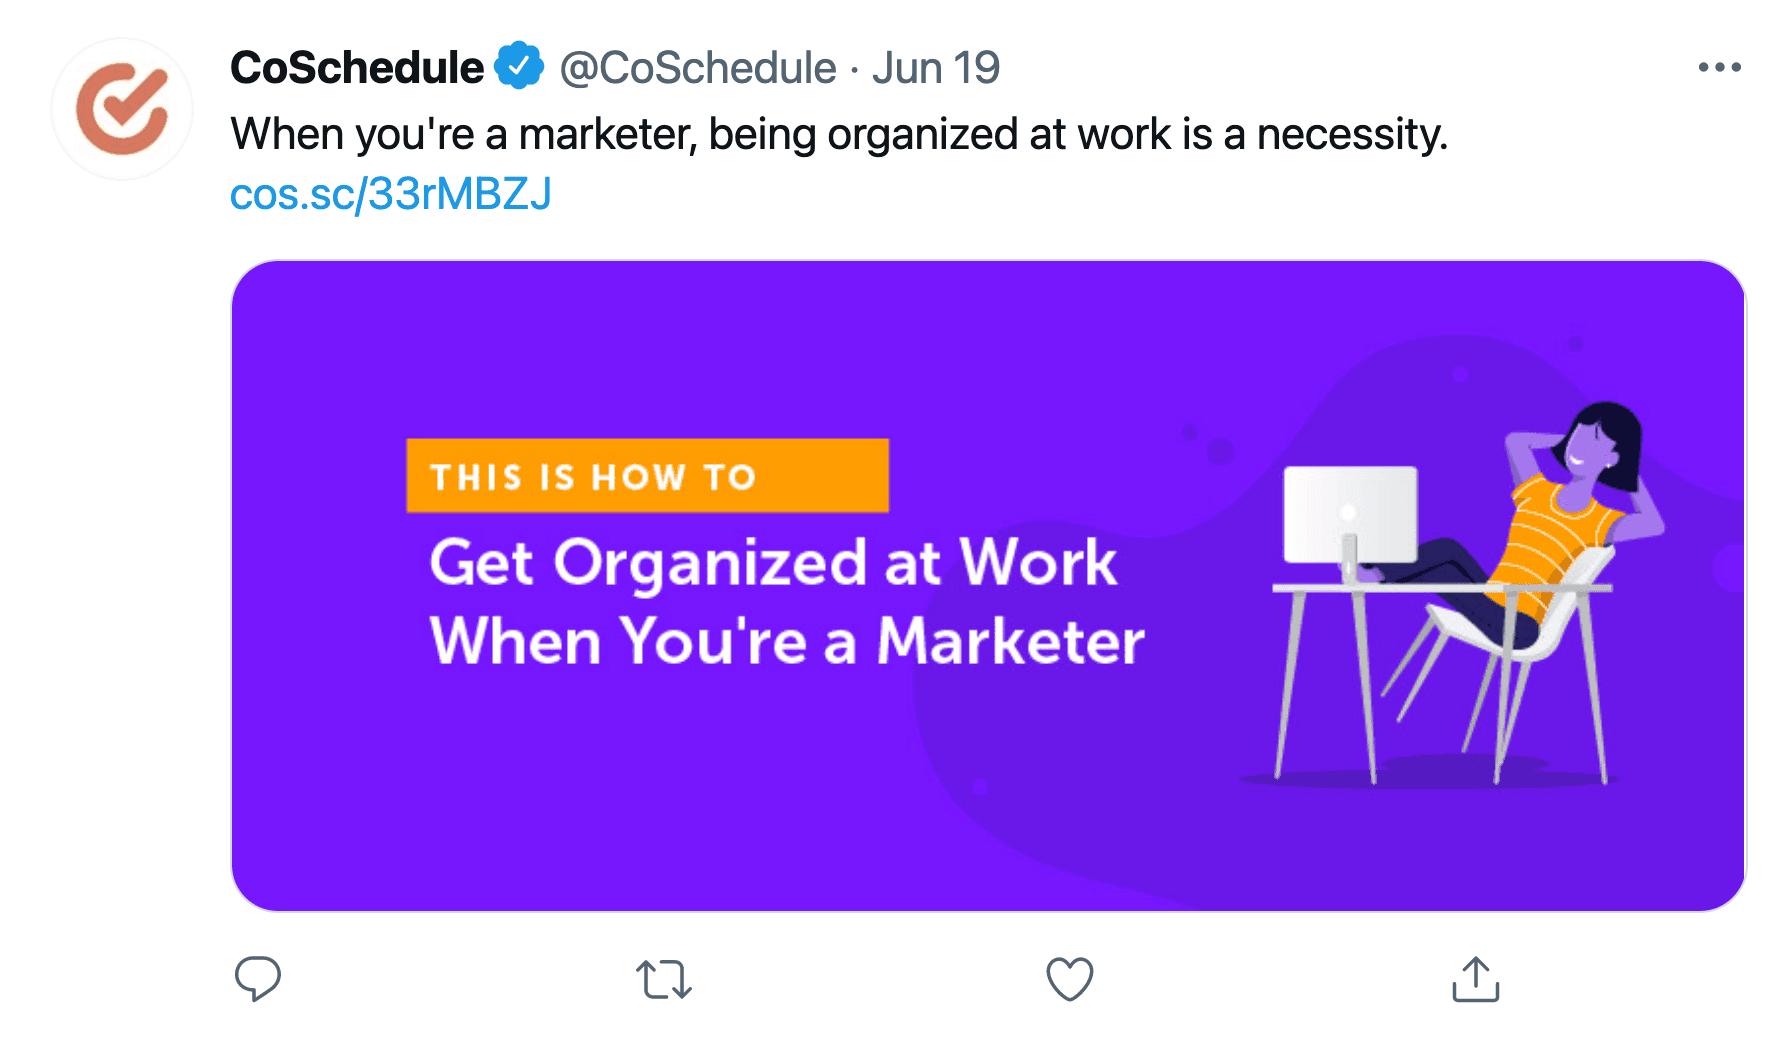 CoSchedule Twitter post example